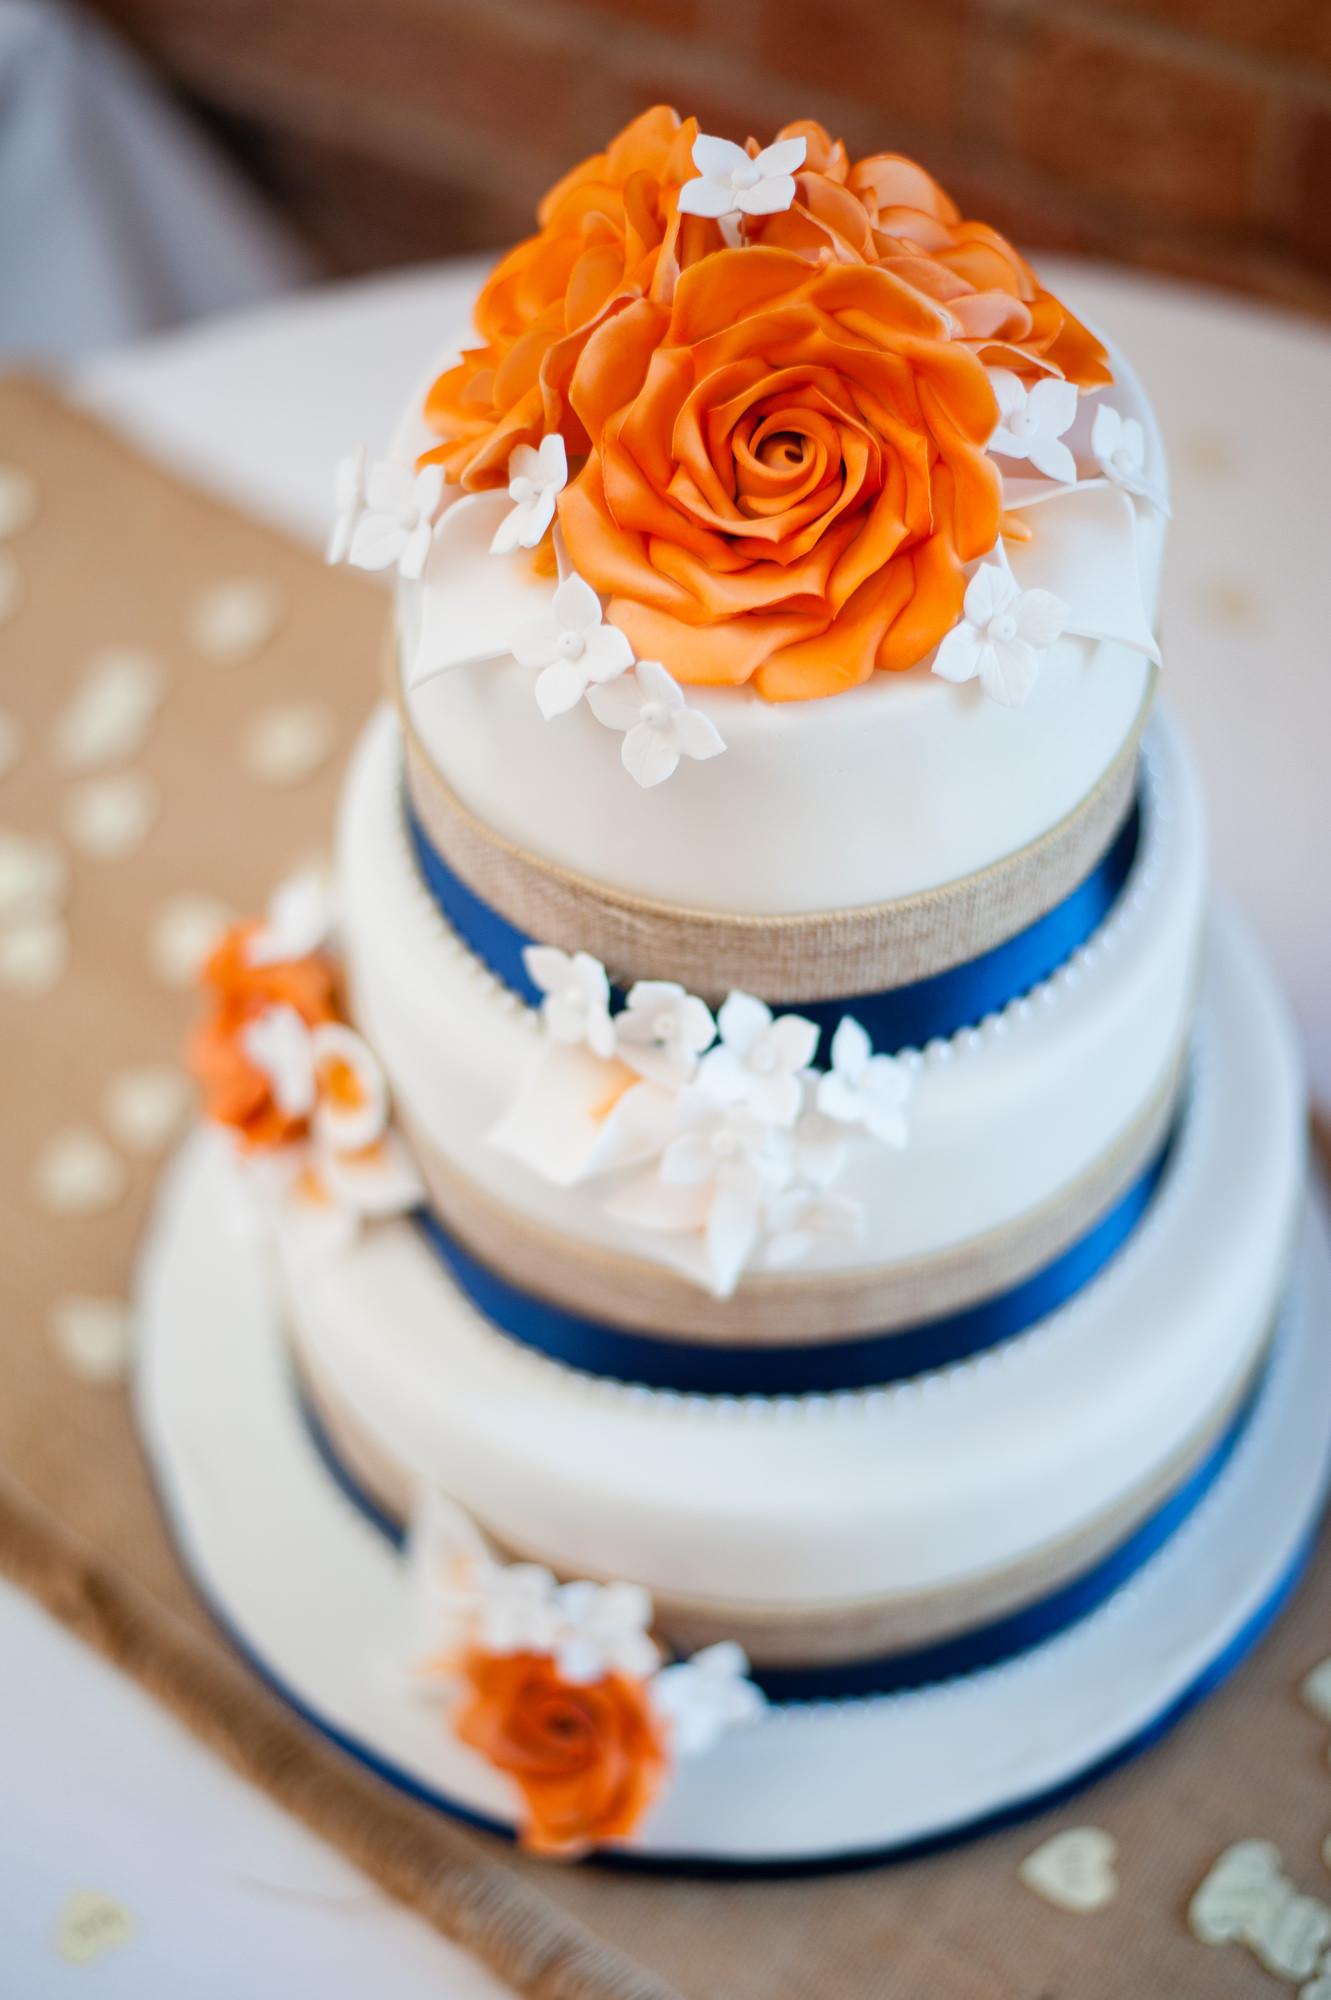 Orange And Blue Wedding Cake With Flowers